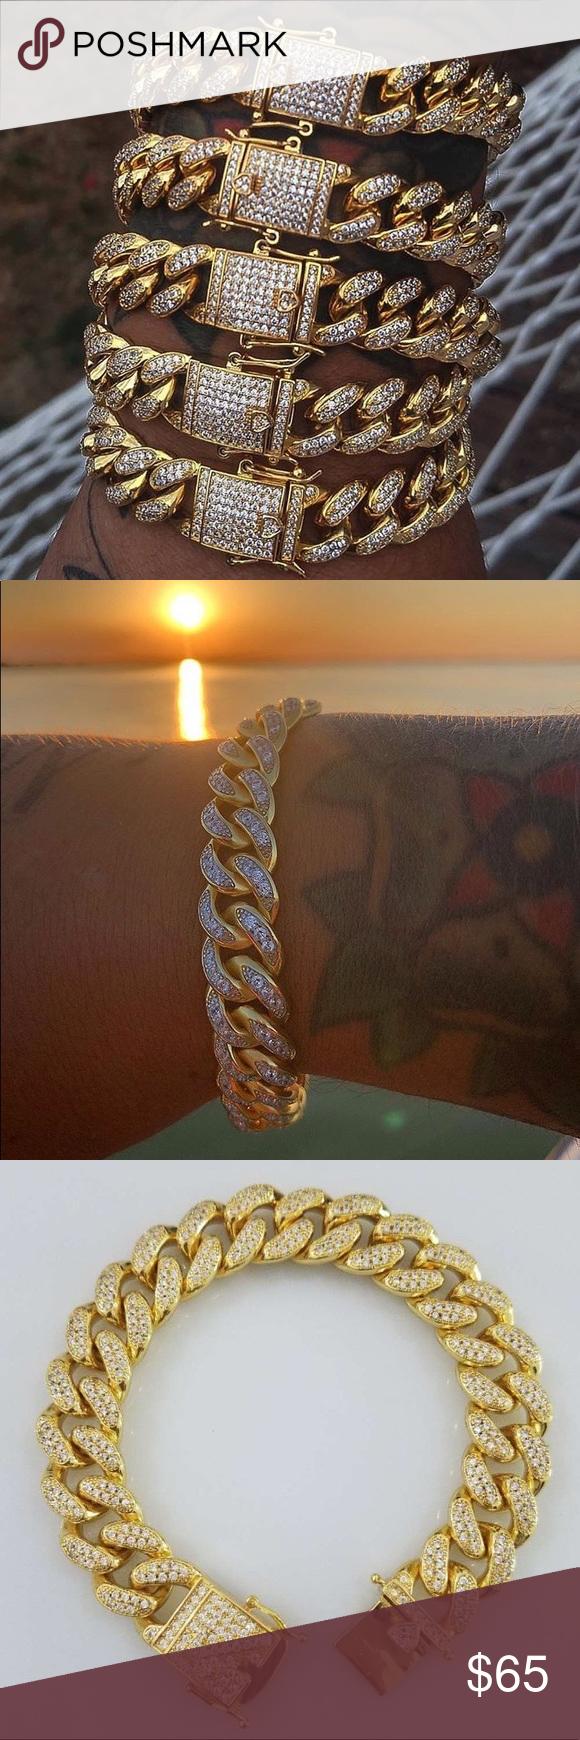 Cuban bracelet k premium gold electroplated lab diamonds